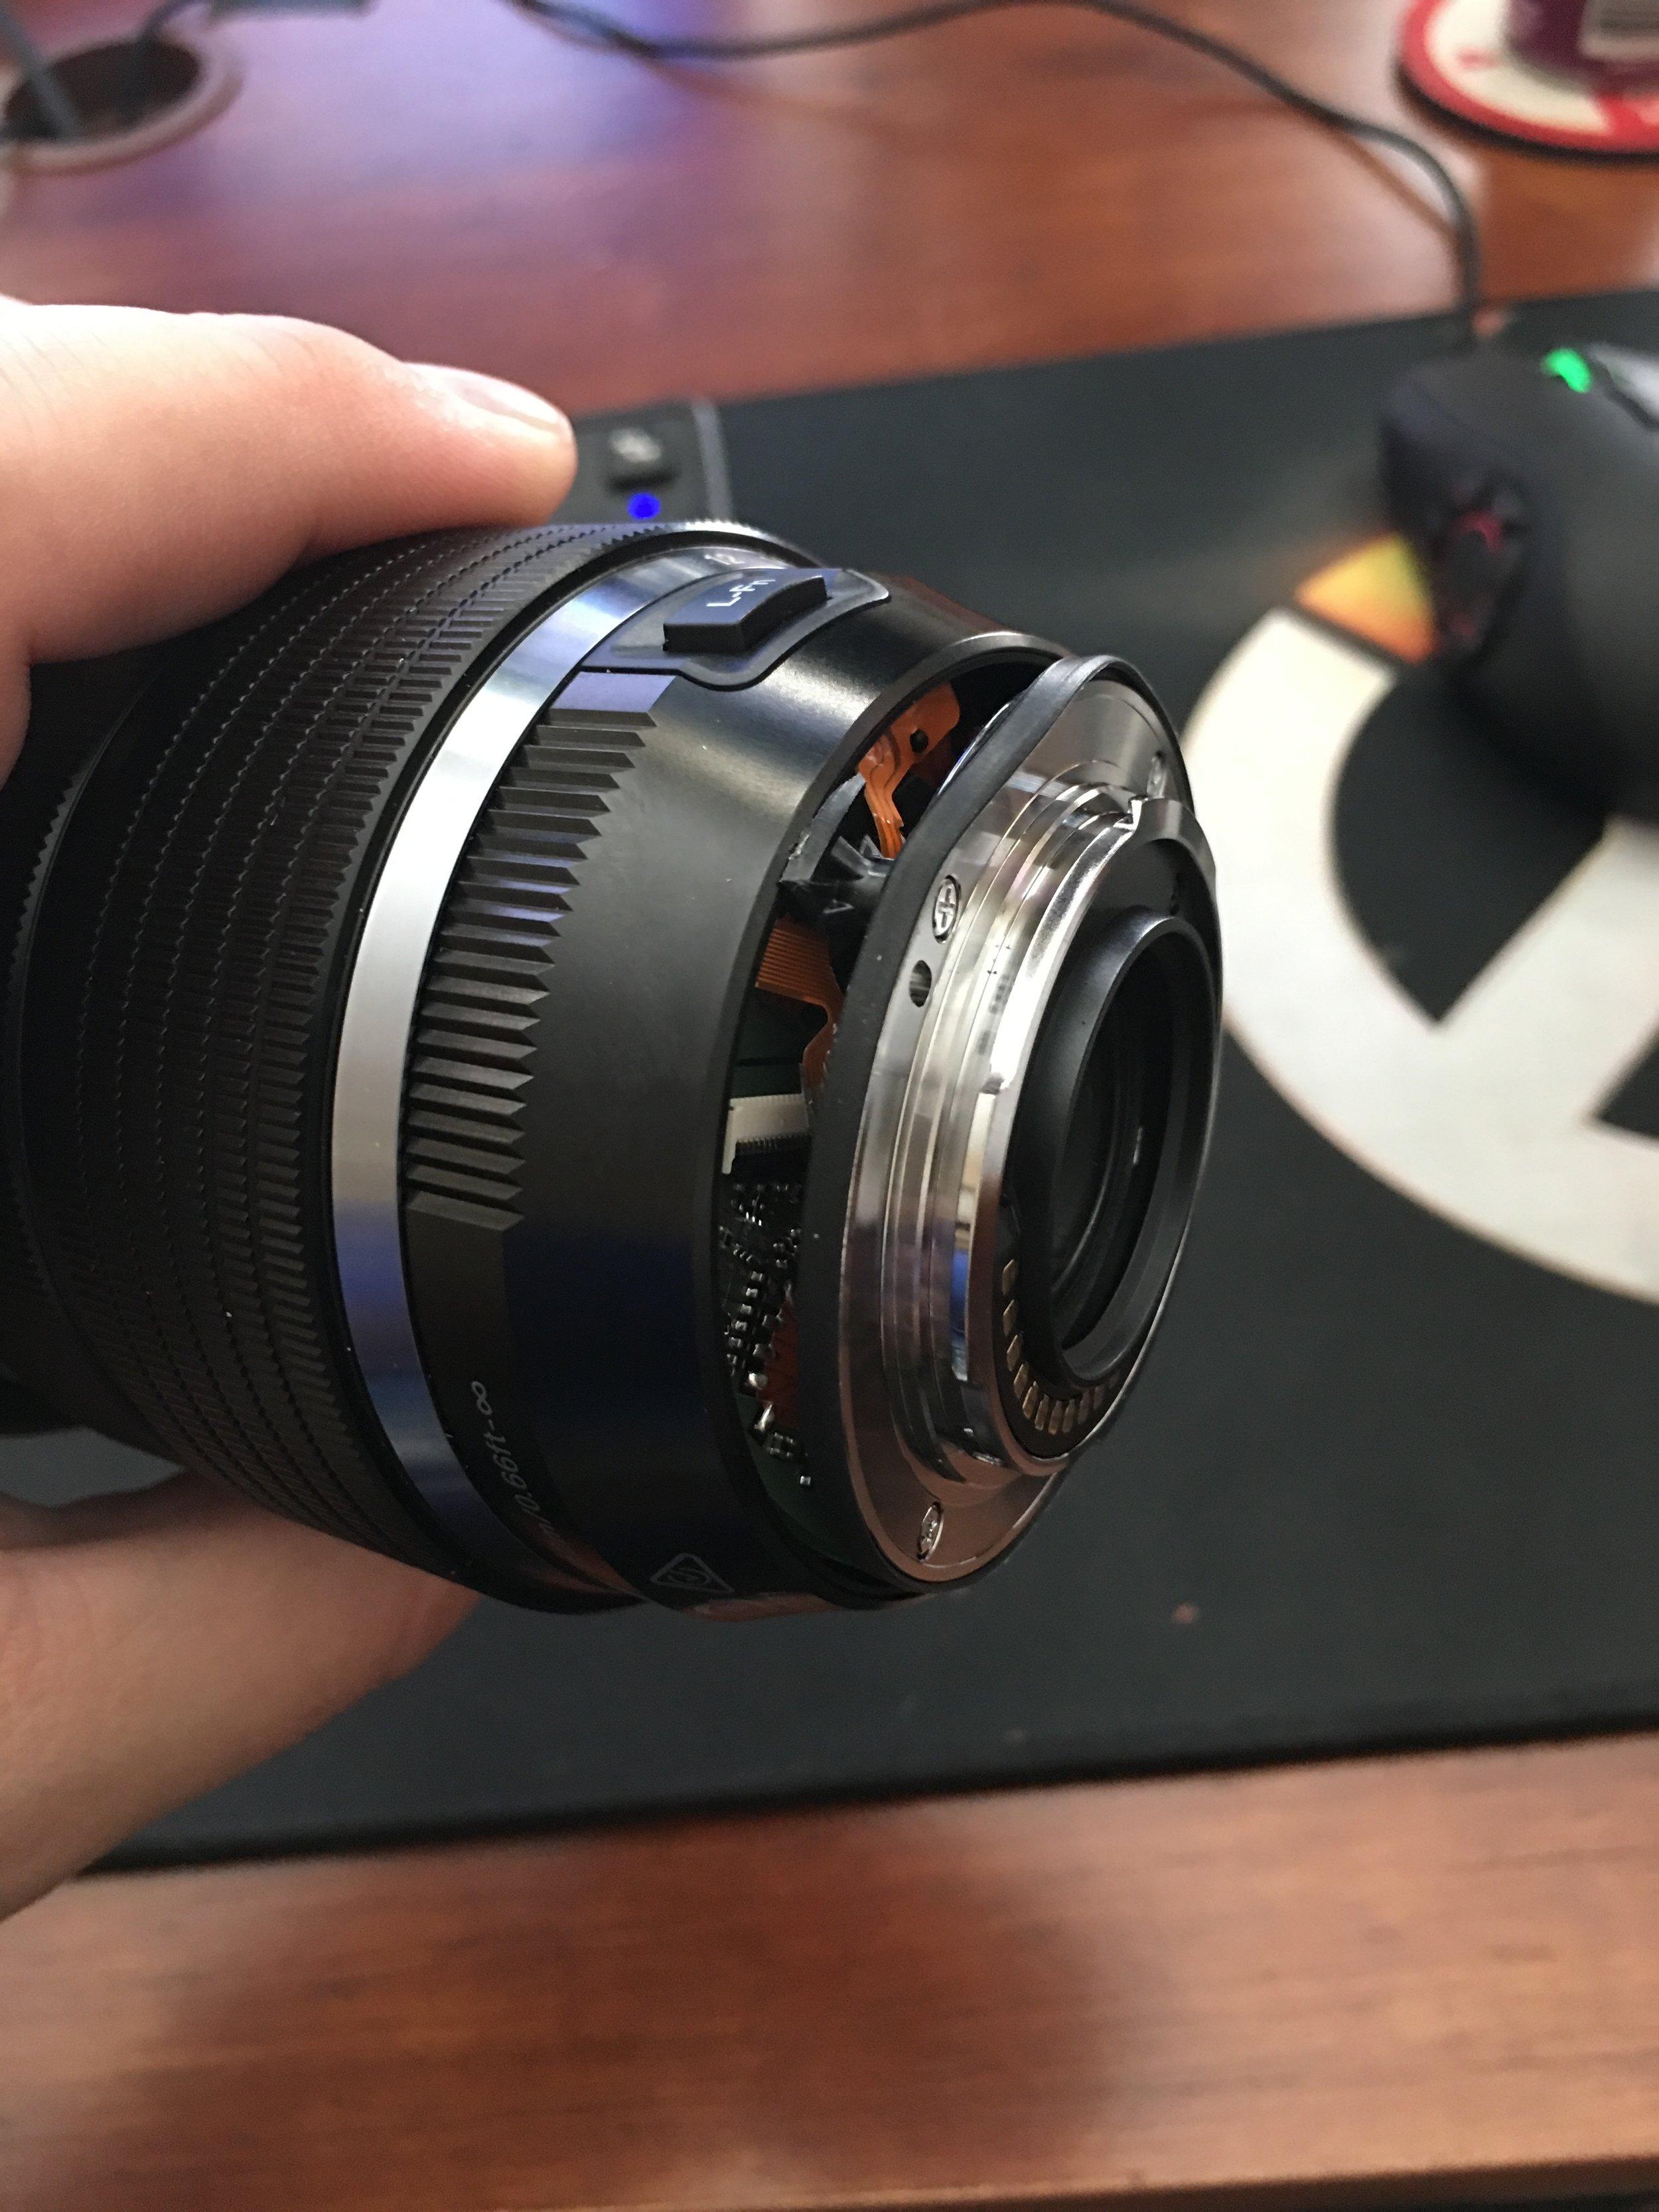 RIP lens